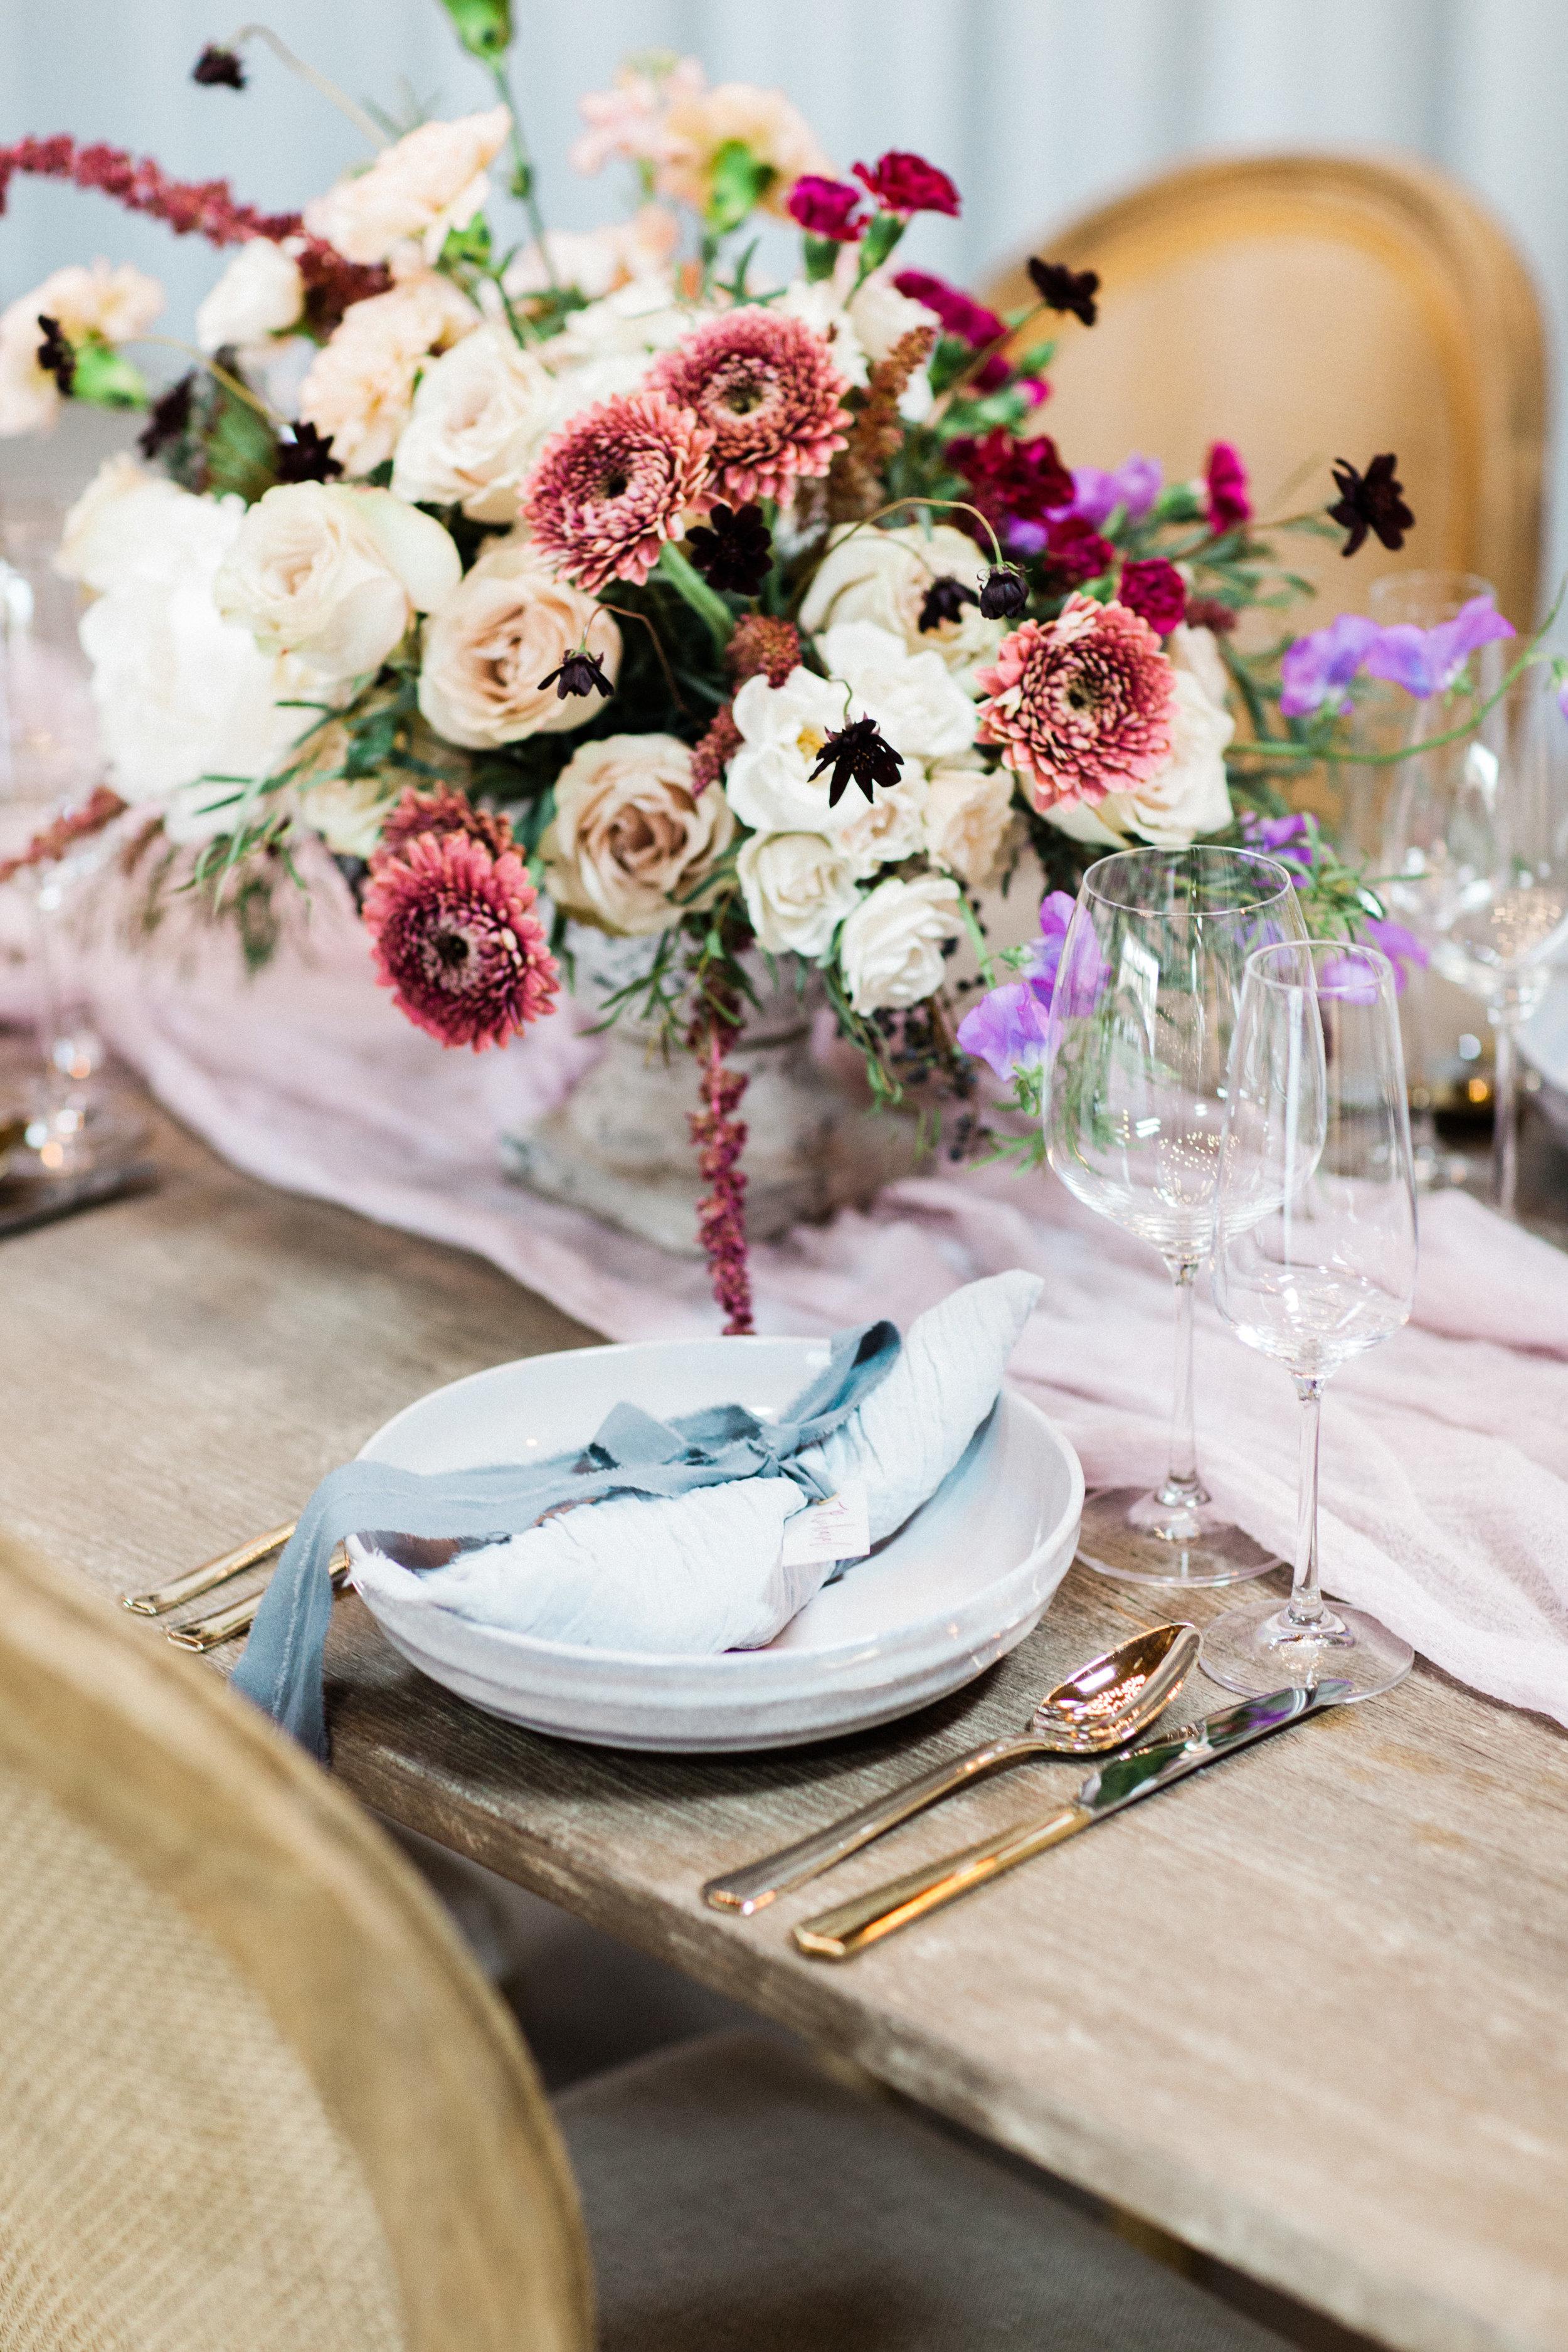 Mauve and Lavender Modern Wedding Inspiration - Tablescape